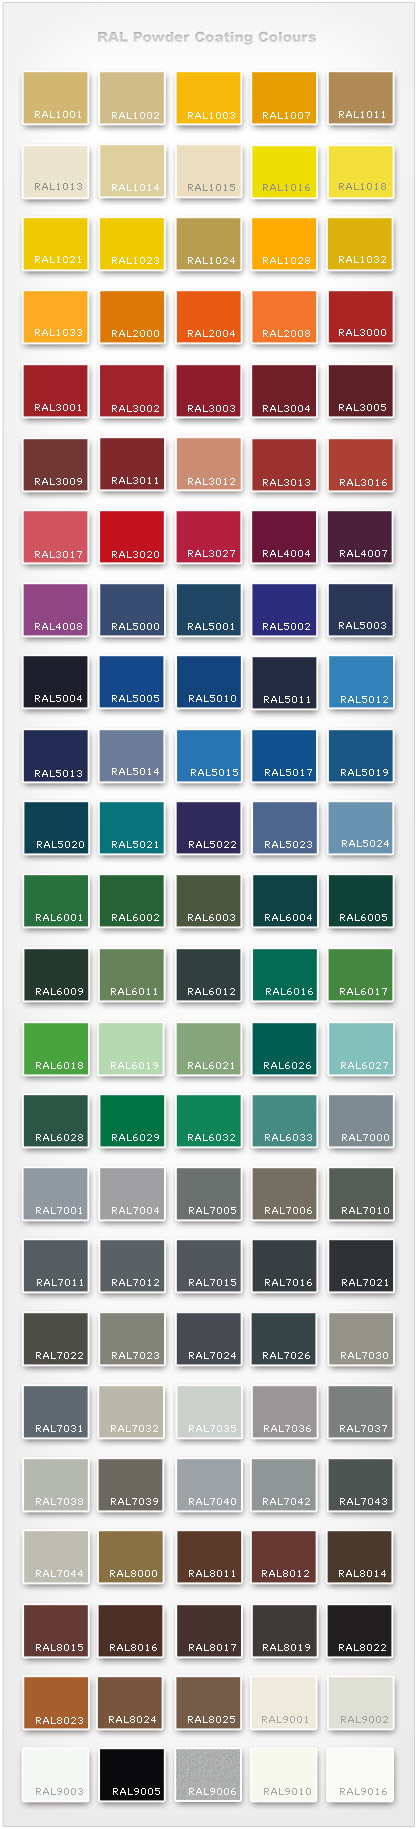 Ral Colours V1 Jpg 418 1829 Ral Colours Georgian Homes Home Decor